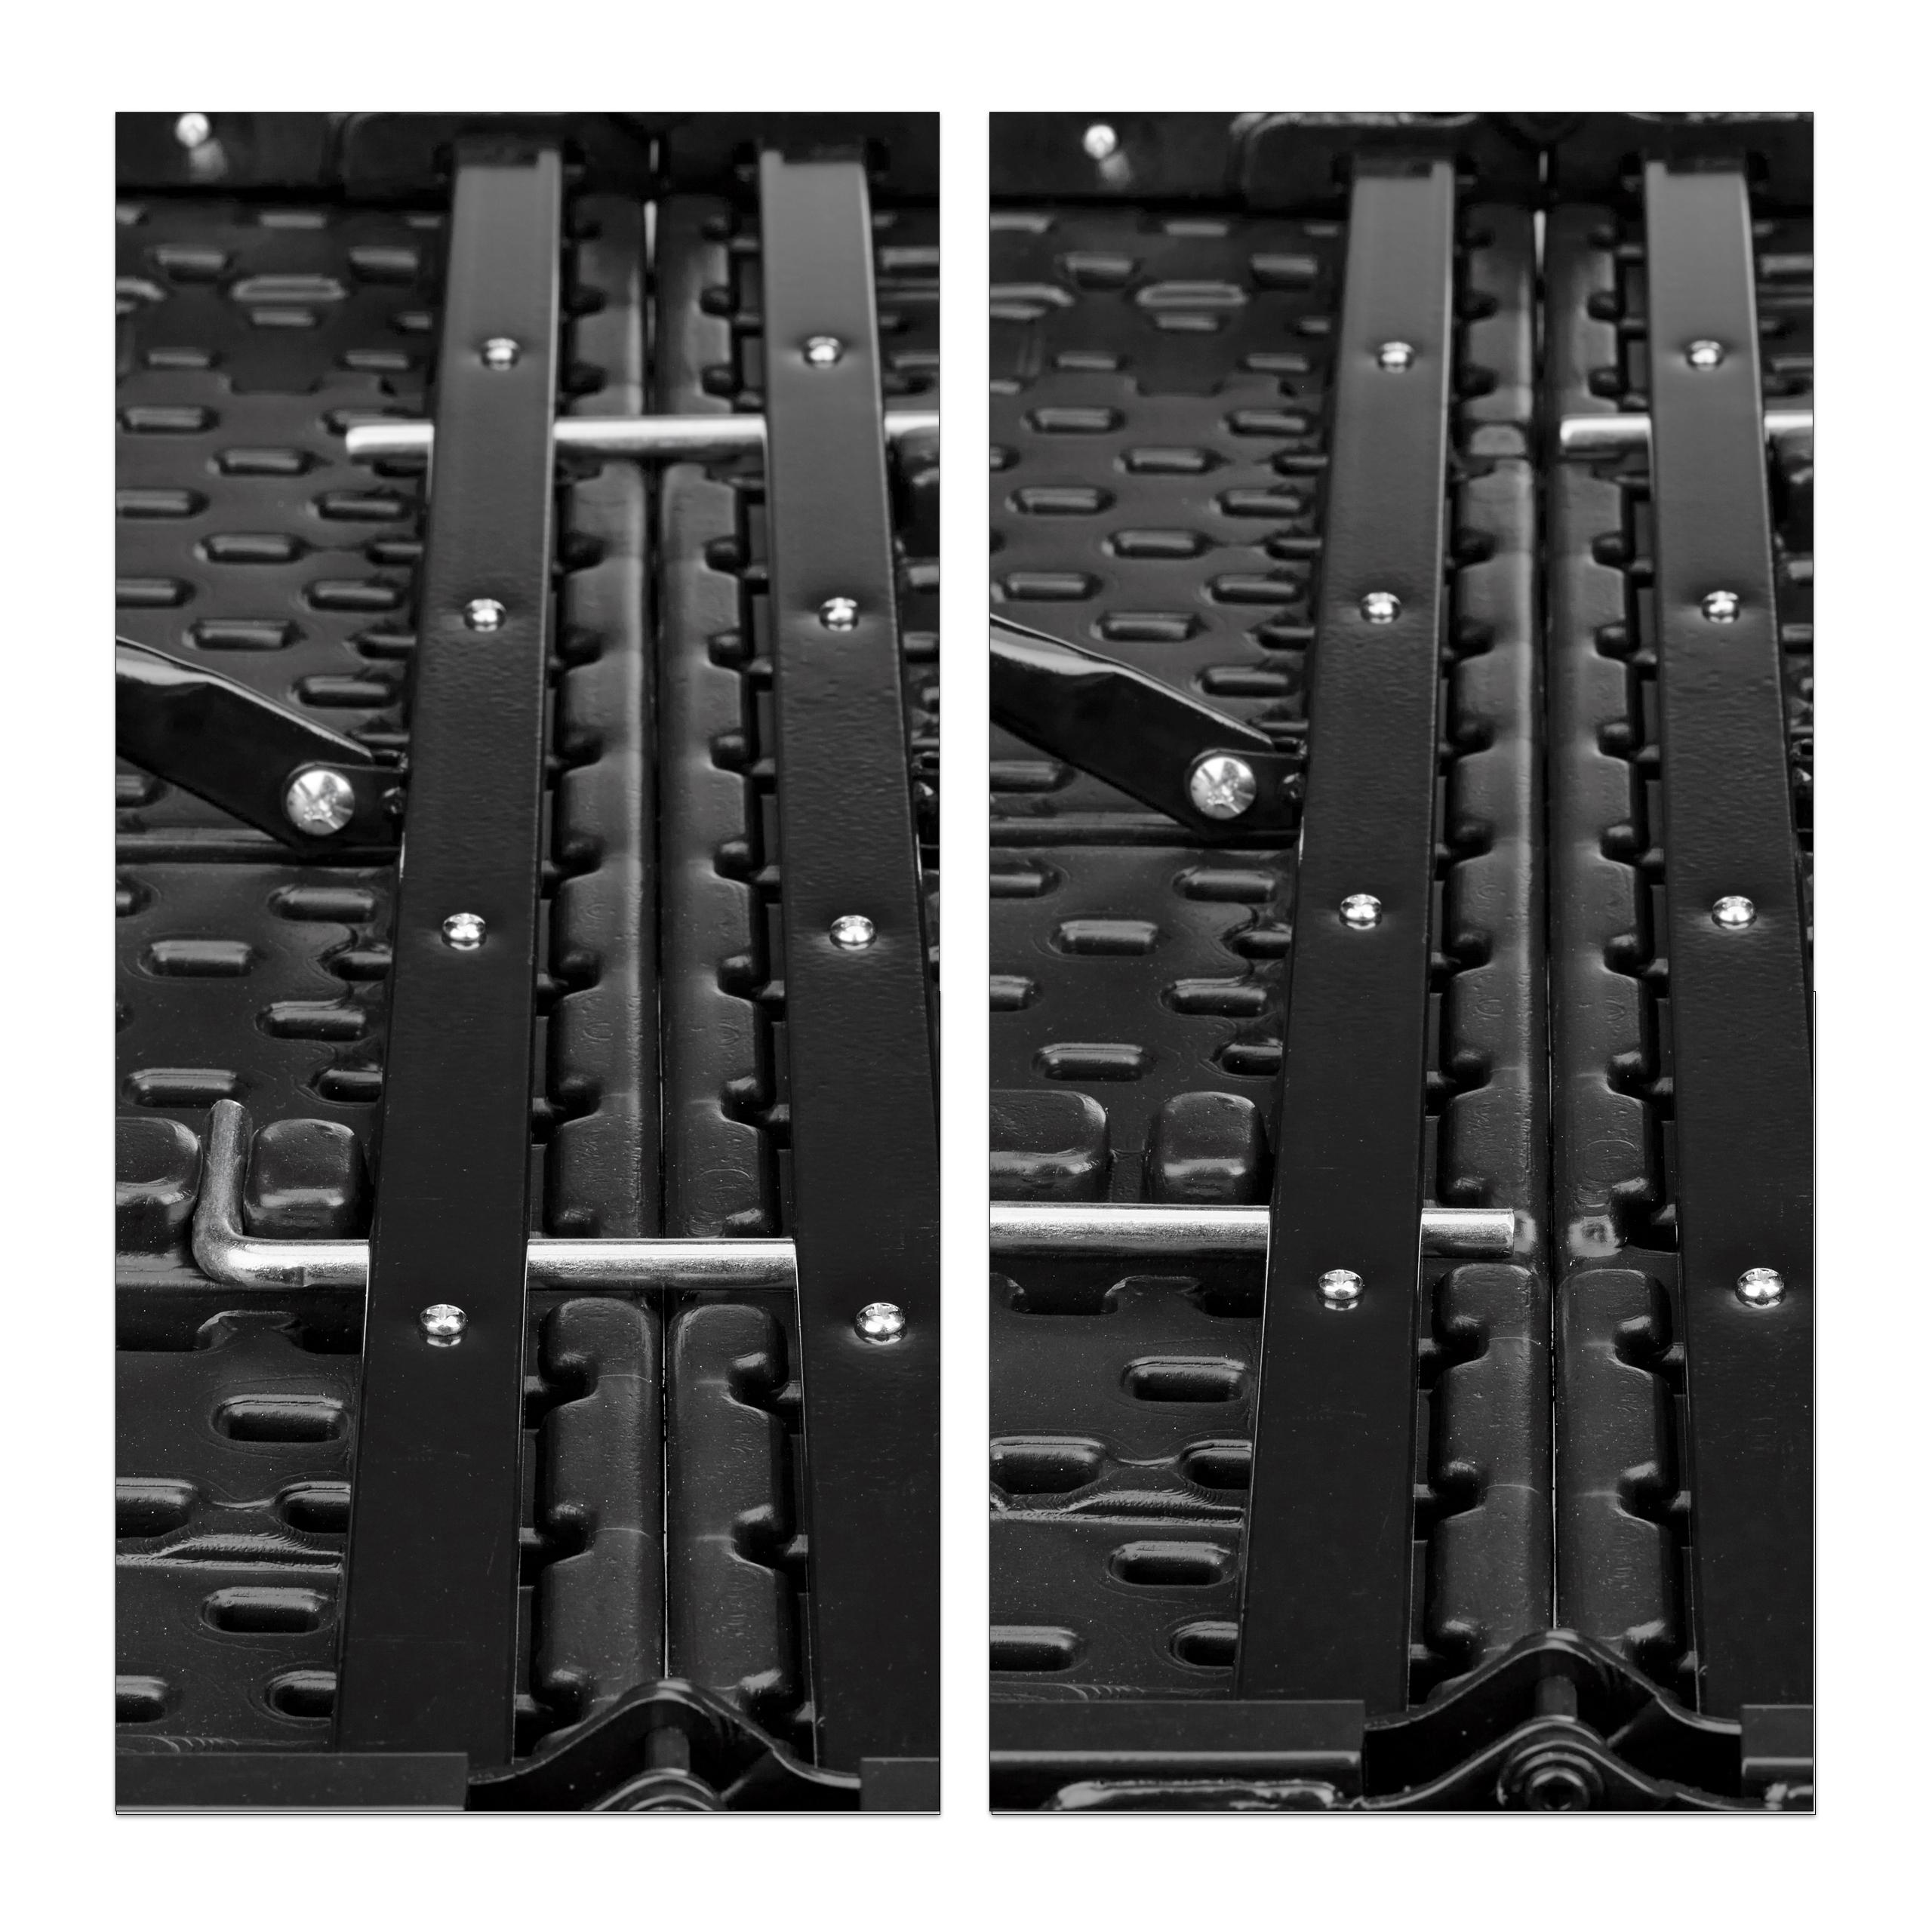 Bierzeltgarnitur-klappbar-BASTIAN-in-Rattan-Optik-Gartenmoebel-Set-Biertisch Indexbild 15